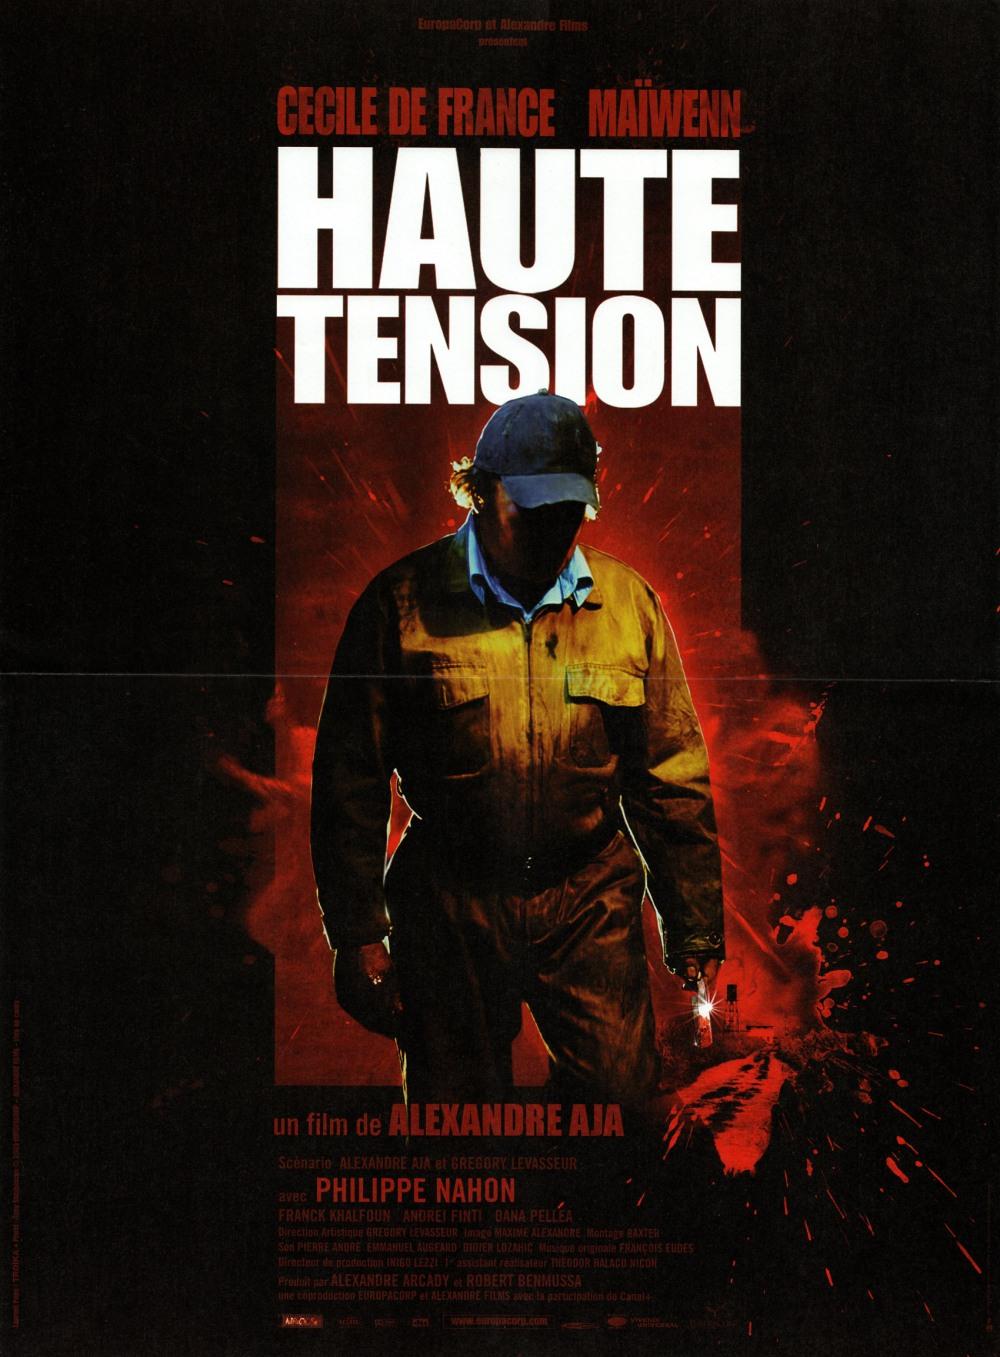 hautetension-france-4